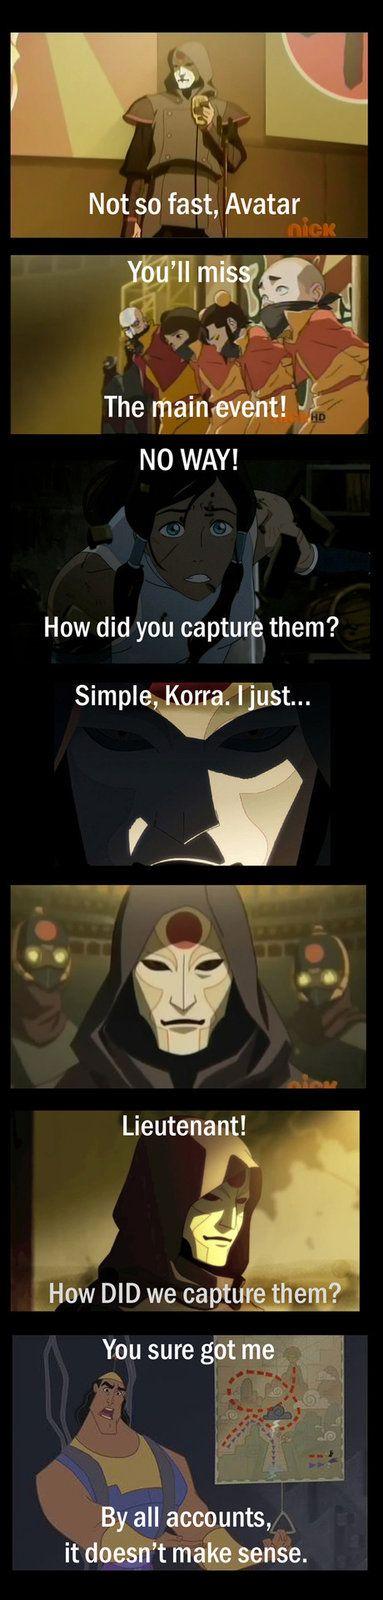 The avatar's new groove.Avatar Awesome, Avatar Humor, Amon And Korra, Airbenderth Legends, Nerdygeeki Stuff, Avatar Atlalok, Legend Of Korra, Legends Of Korra Humor, Emperors New Groove